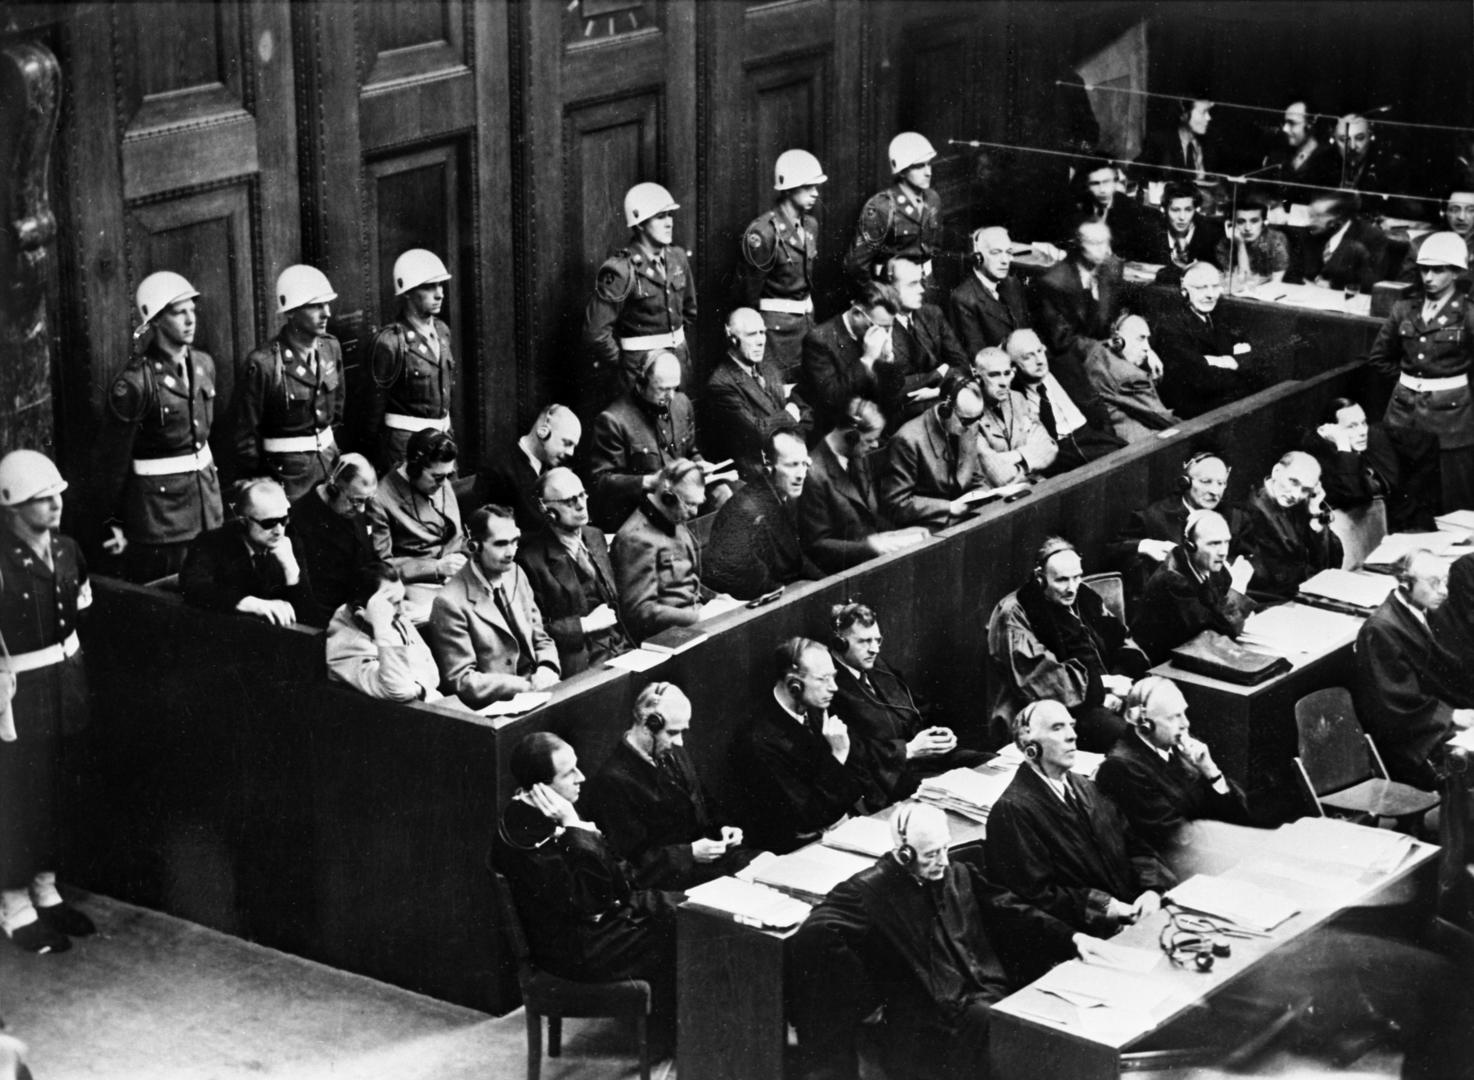 """Gericht der Völker"": Vor 75 Jahren begann das Nürnberger Tribunal"